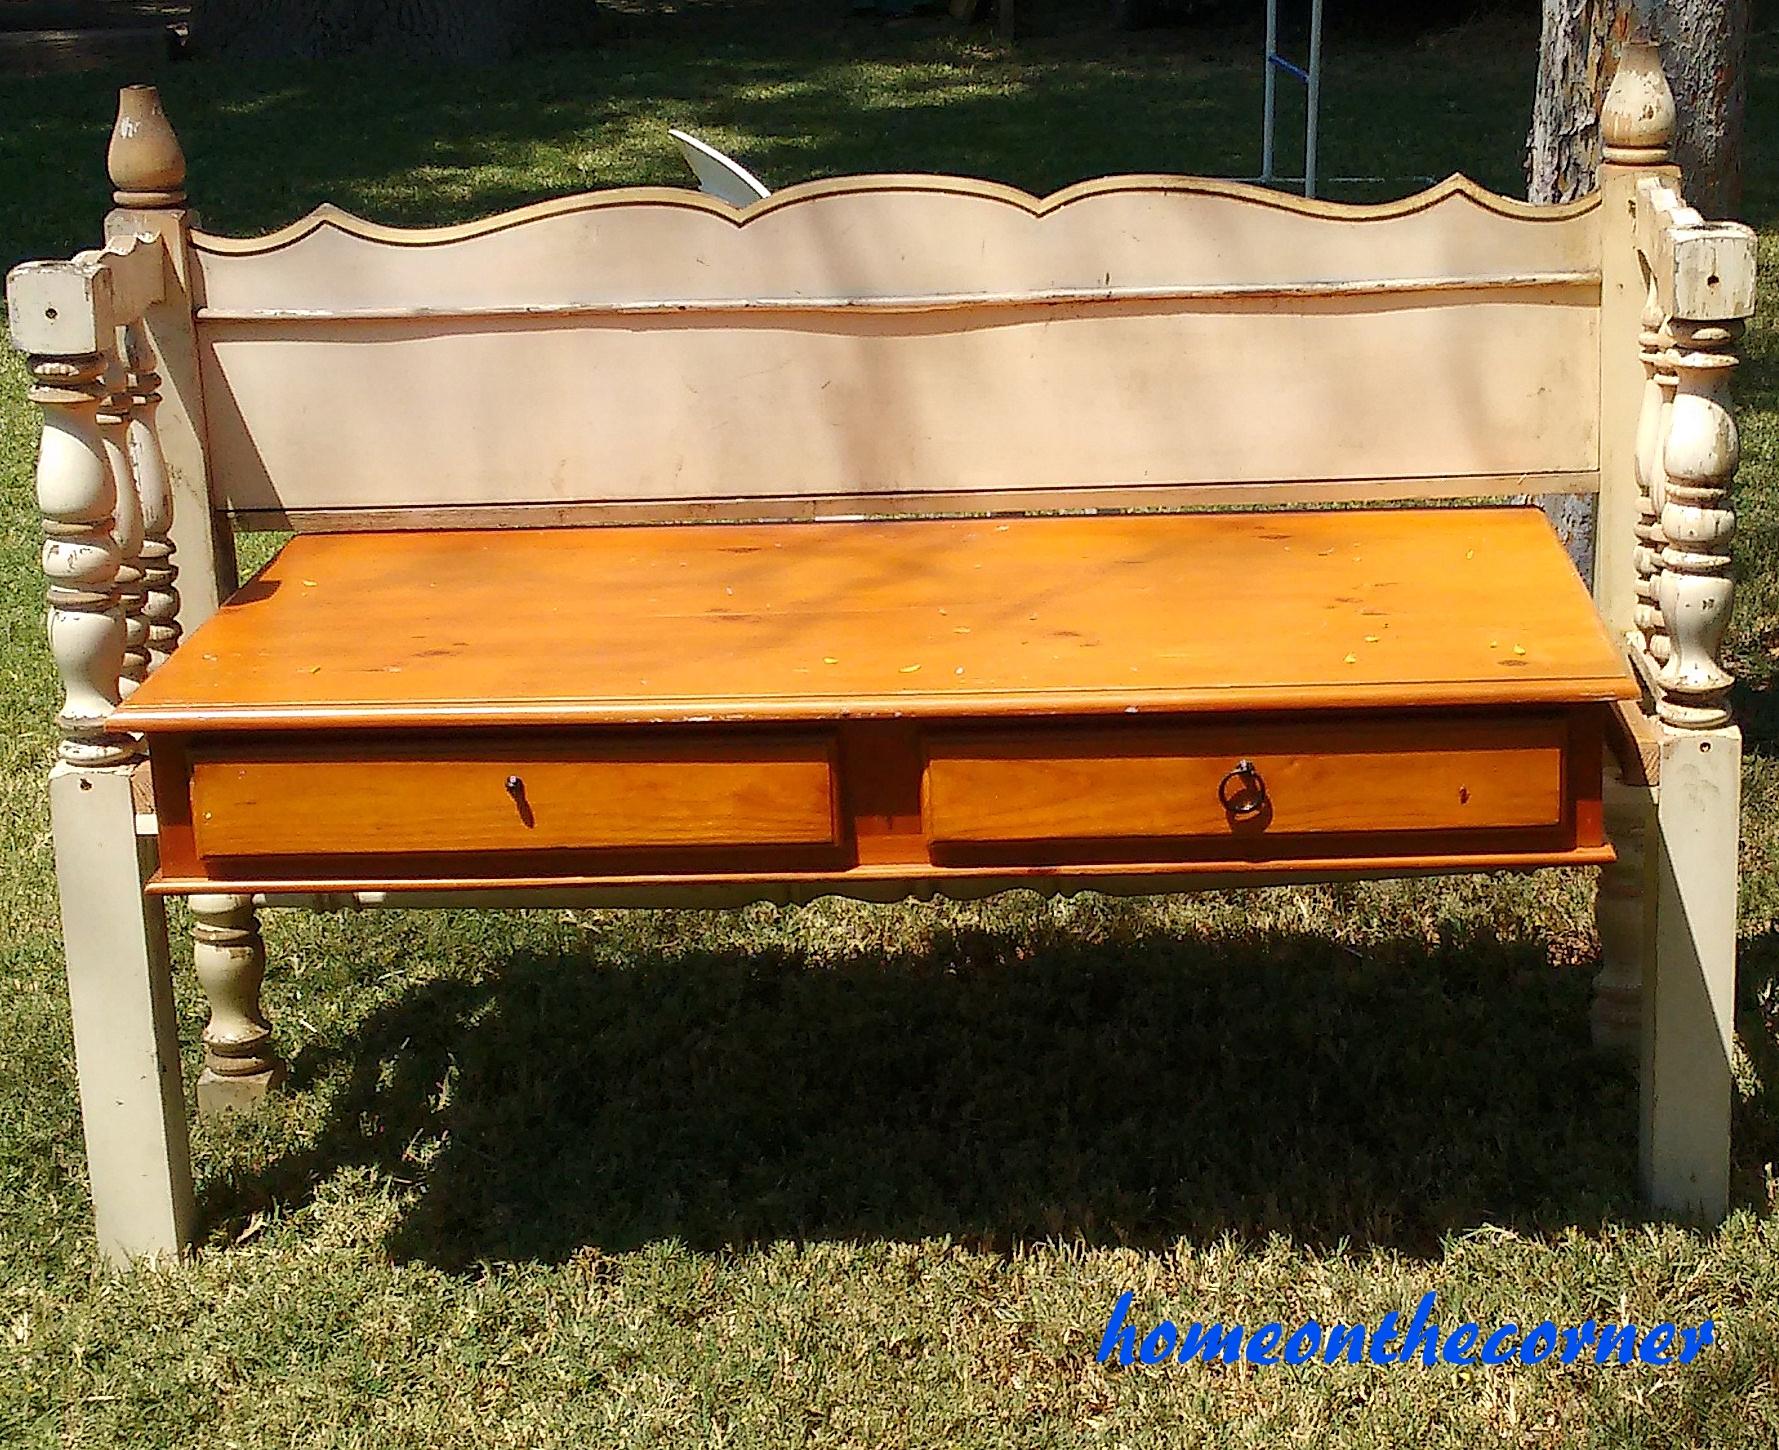 Bench By Bed: Bedframe Plus Desk Equals Bench